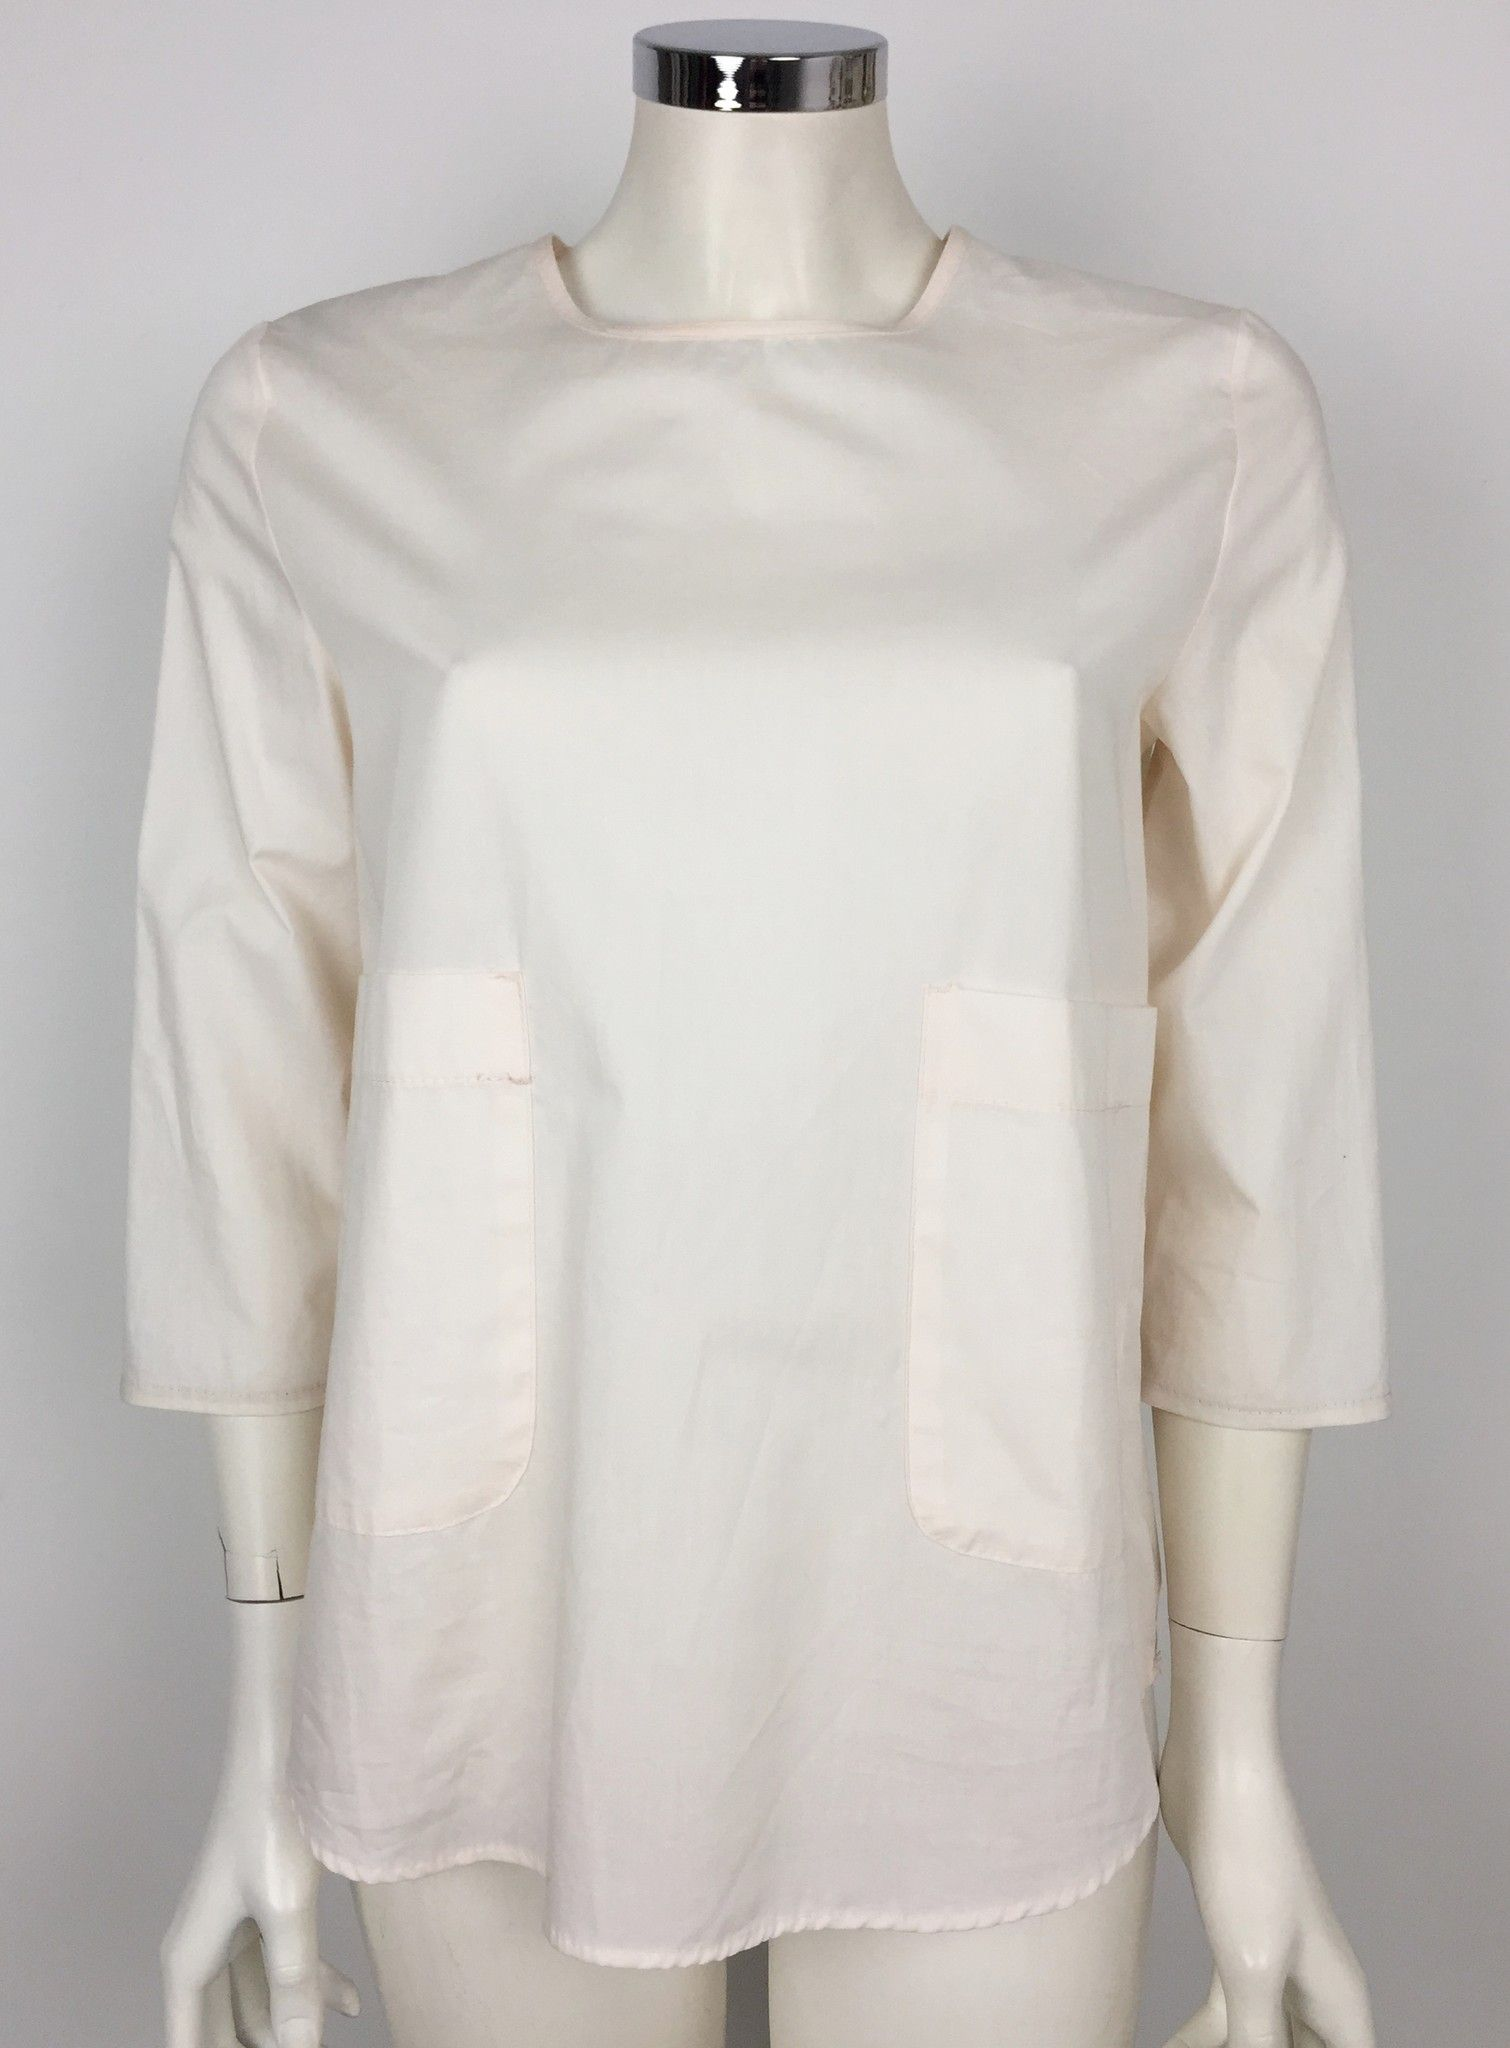 LadyBug 3/4 Sleeve Shirt with Pockets Cod.TQ0302